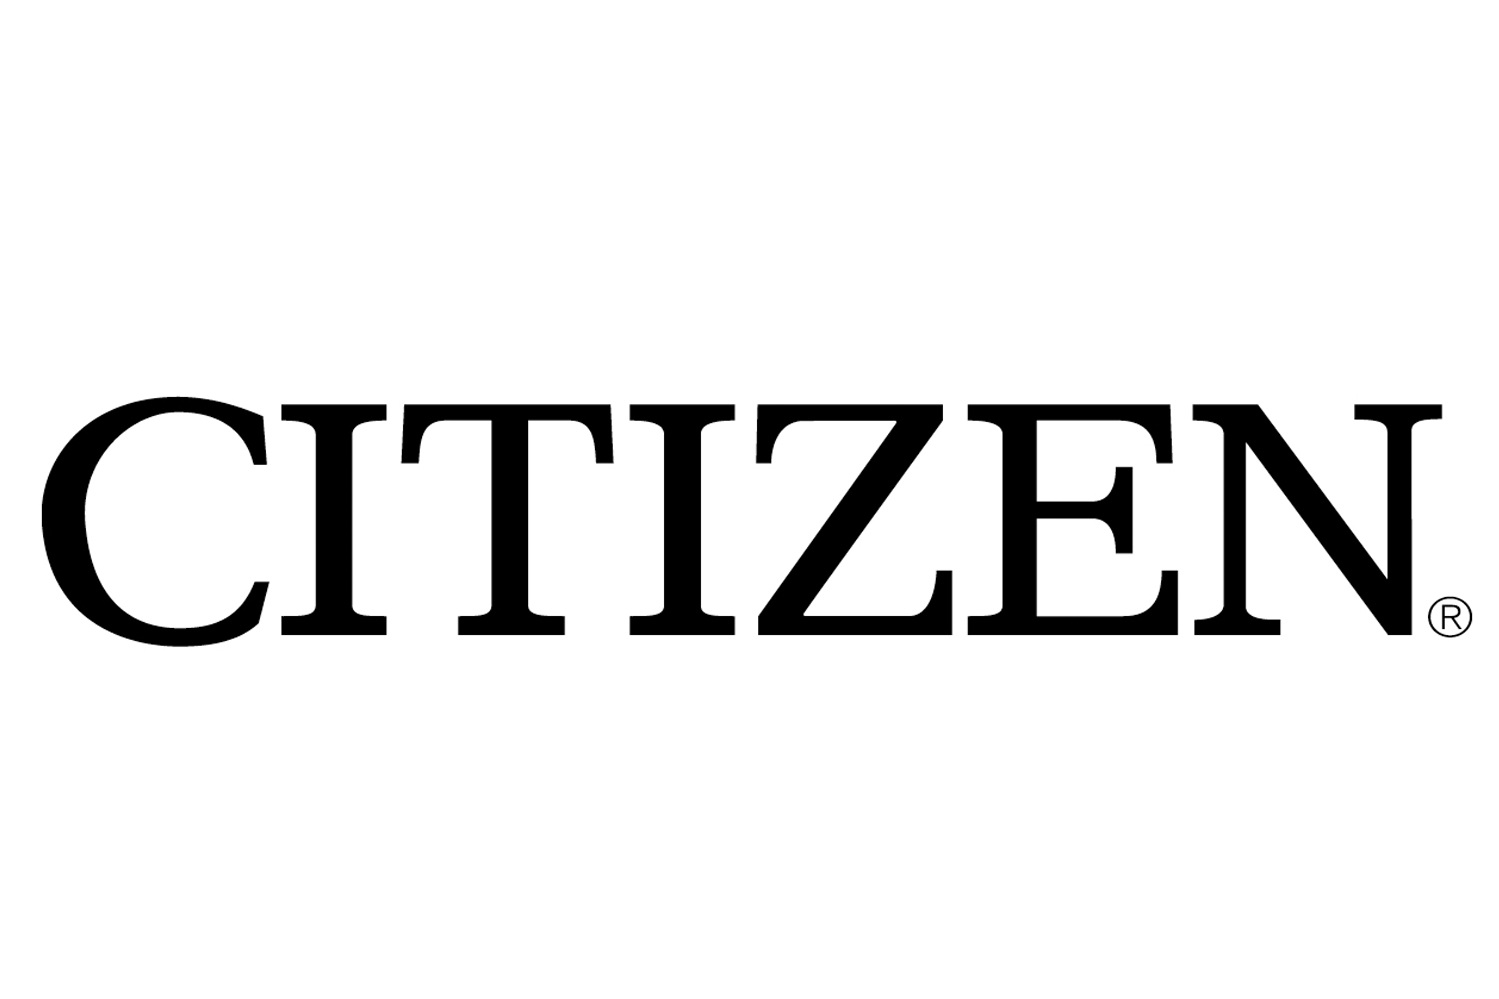 Citizen_logo_south_hills_jewelers_Pittsburgh.jpg